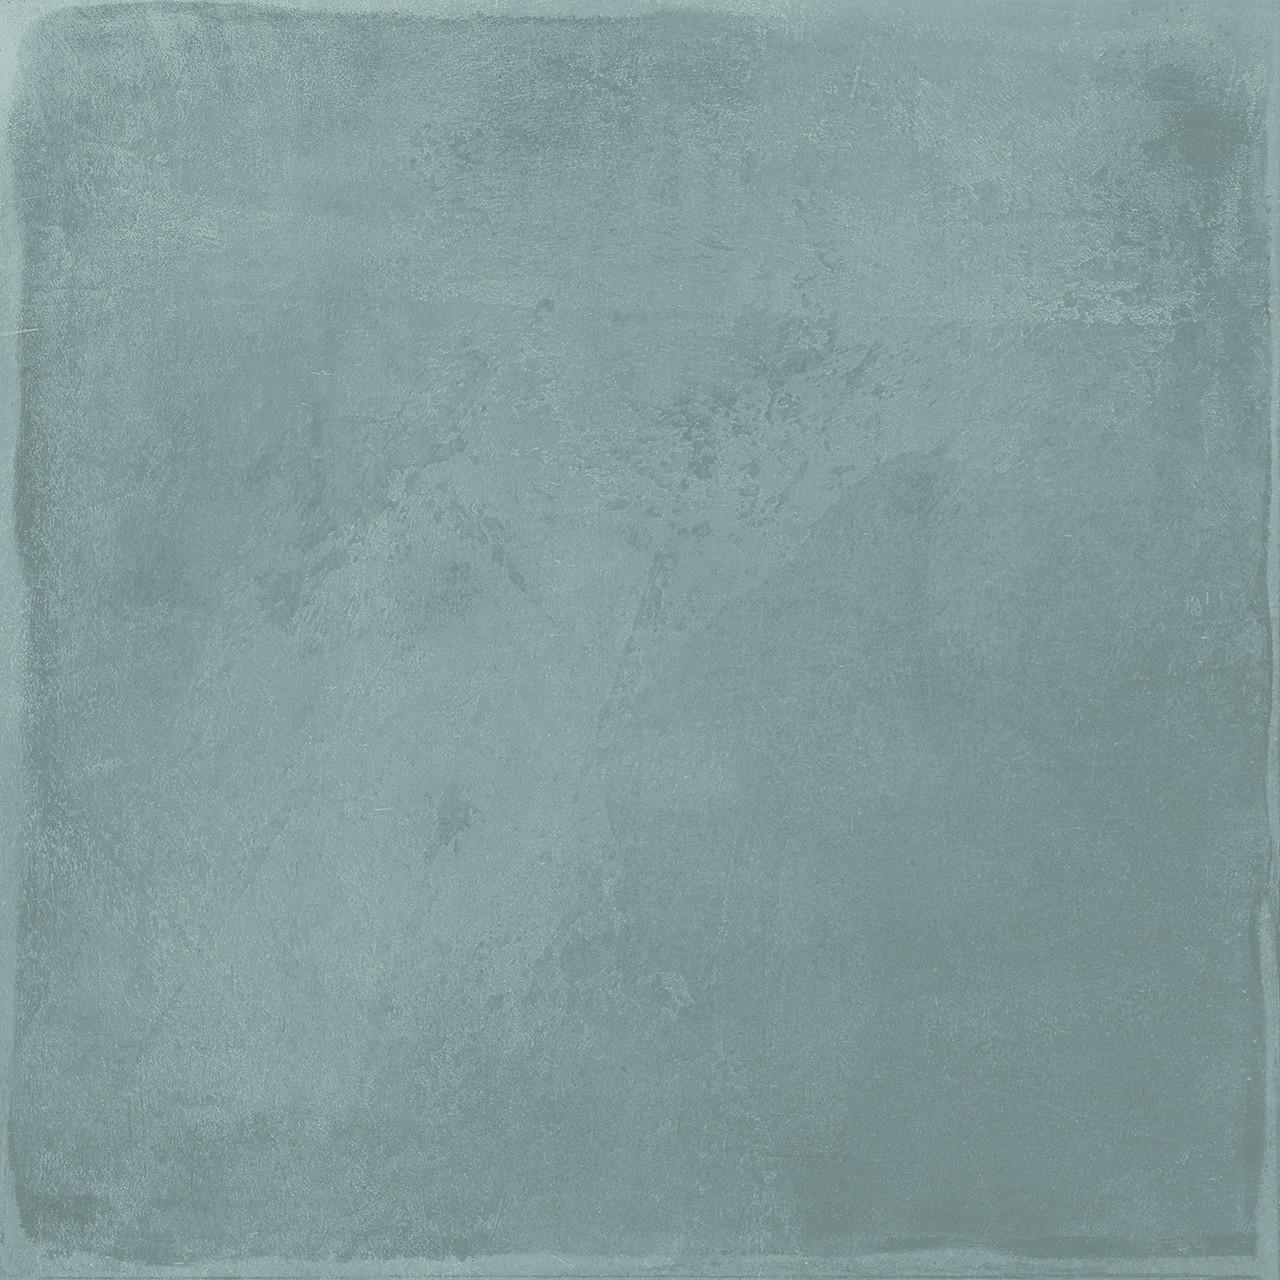 maiolica blue steel matte 8x8 floor tile